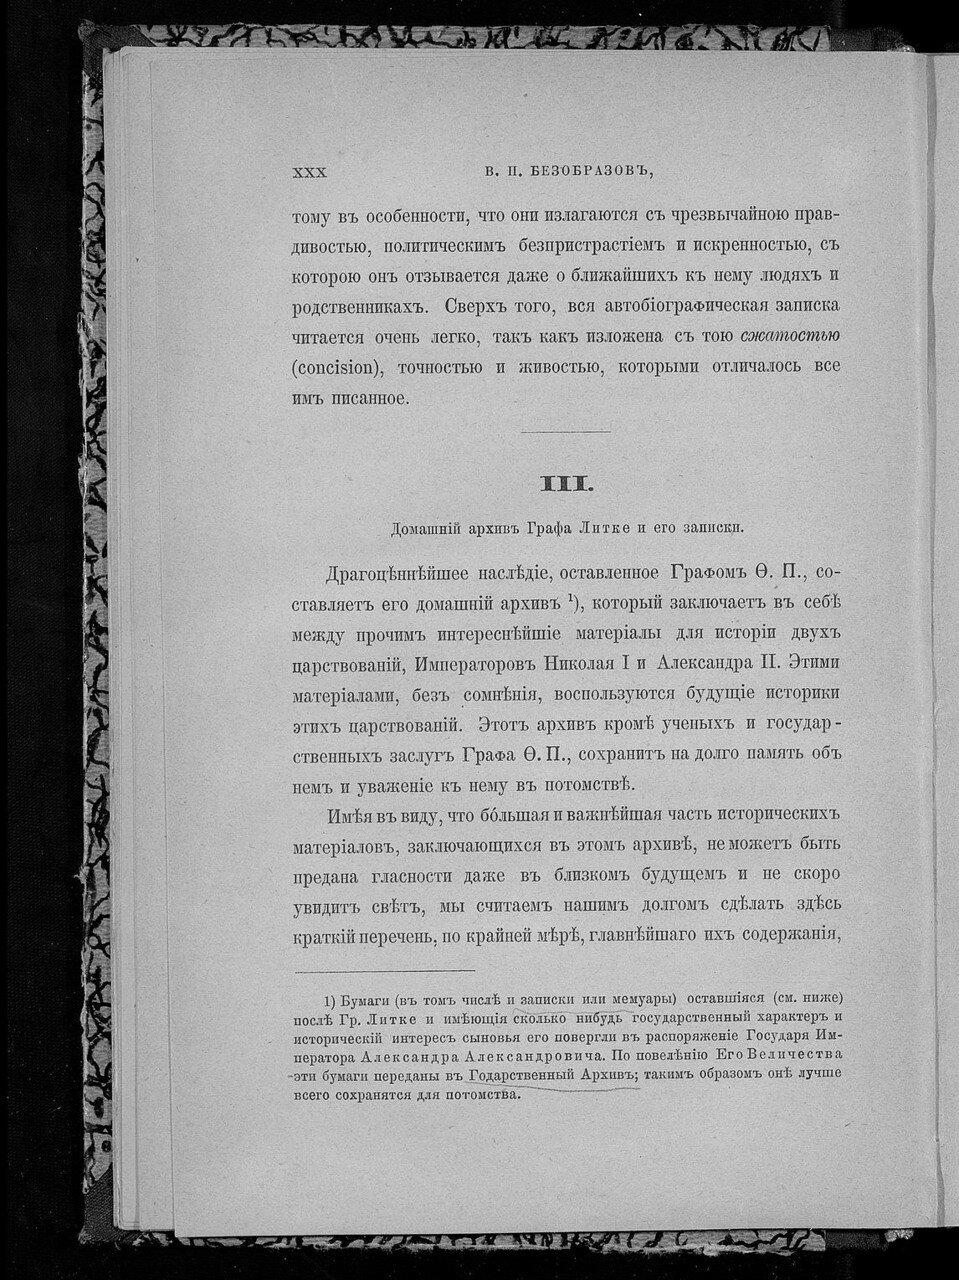 https://img-fotki.yandex.ru/get/369434/199368979.d2/0_21dd70_c067bdbc_XXXL.jpg